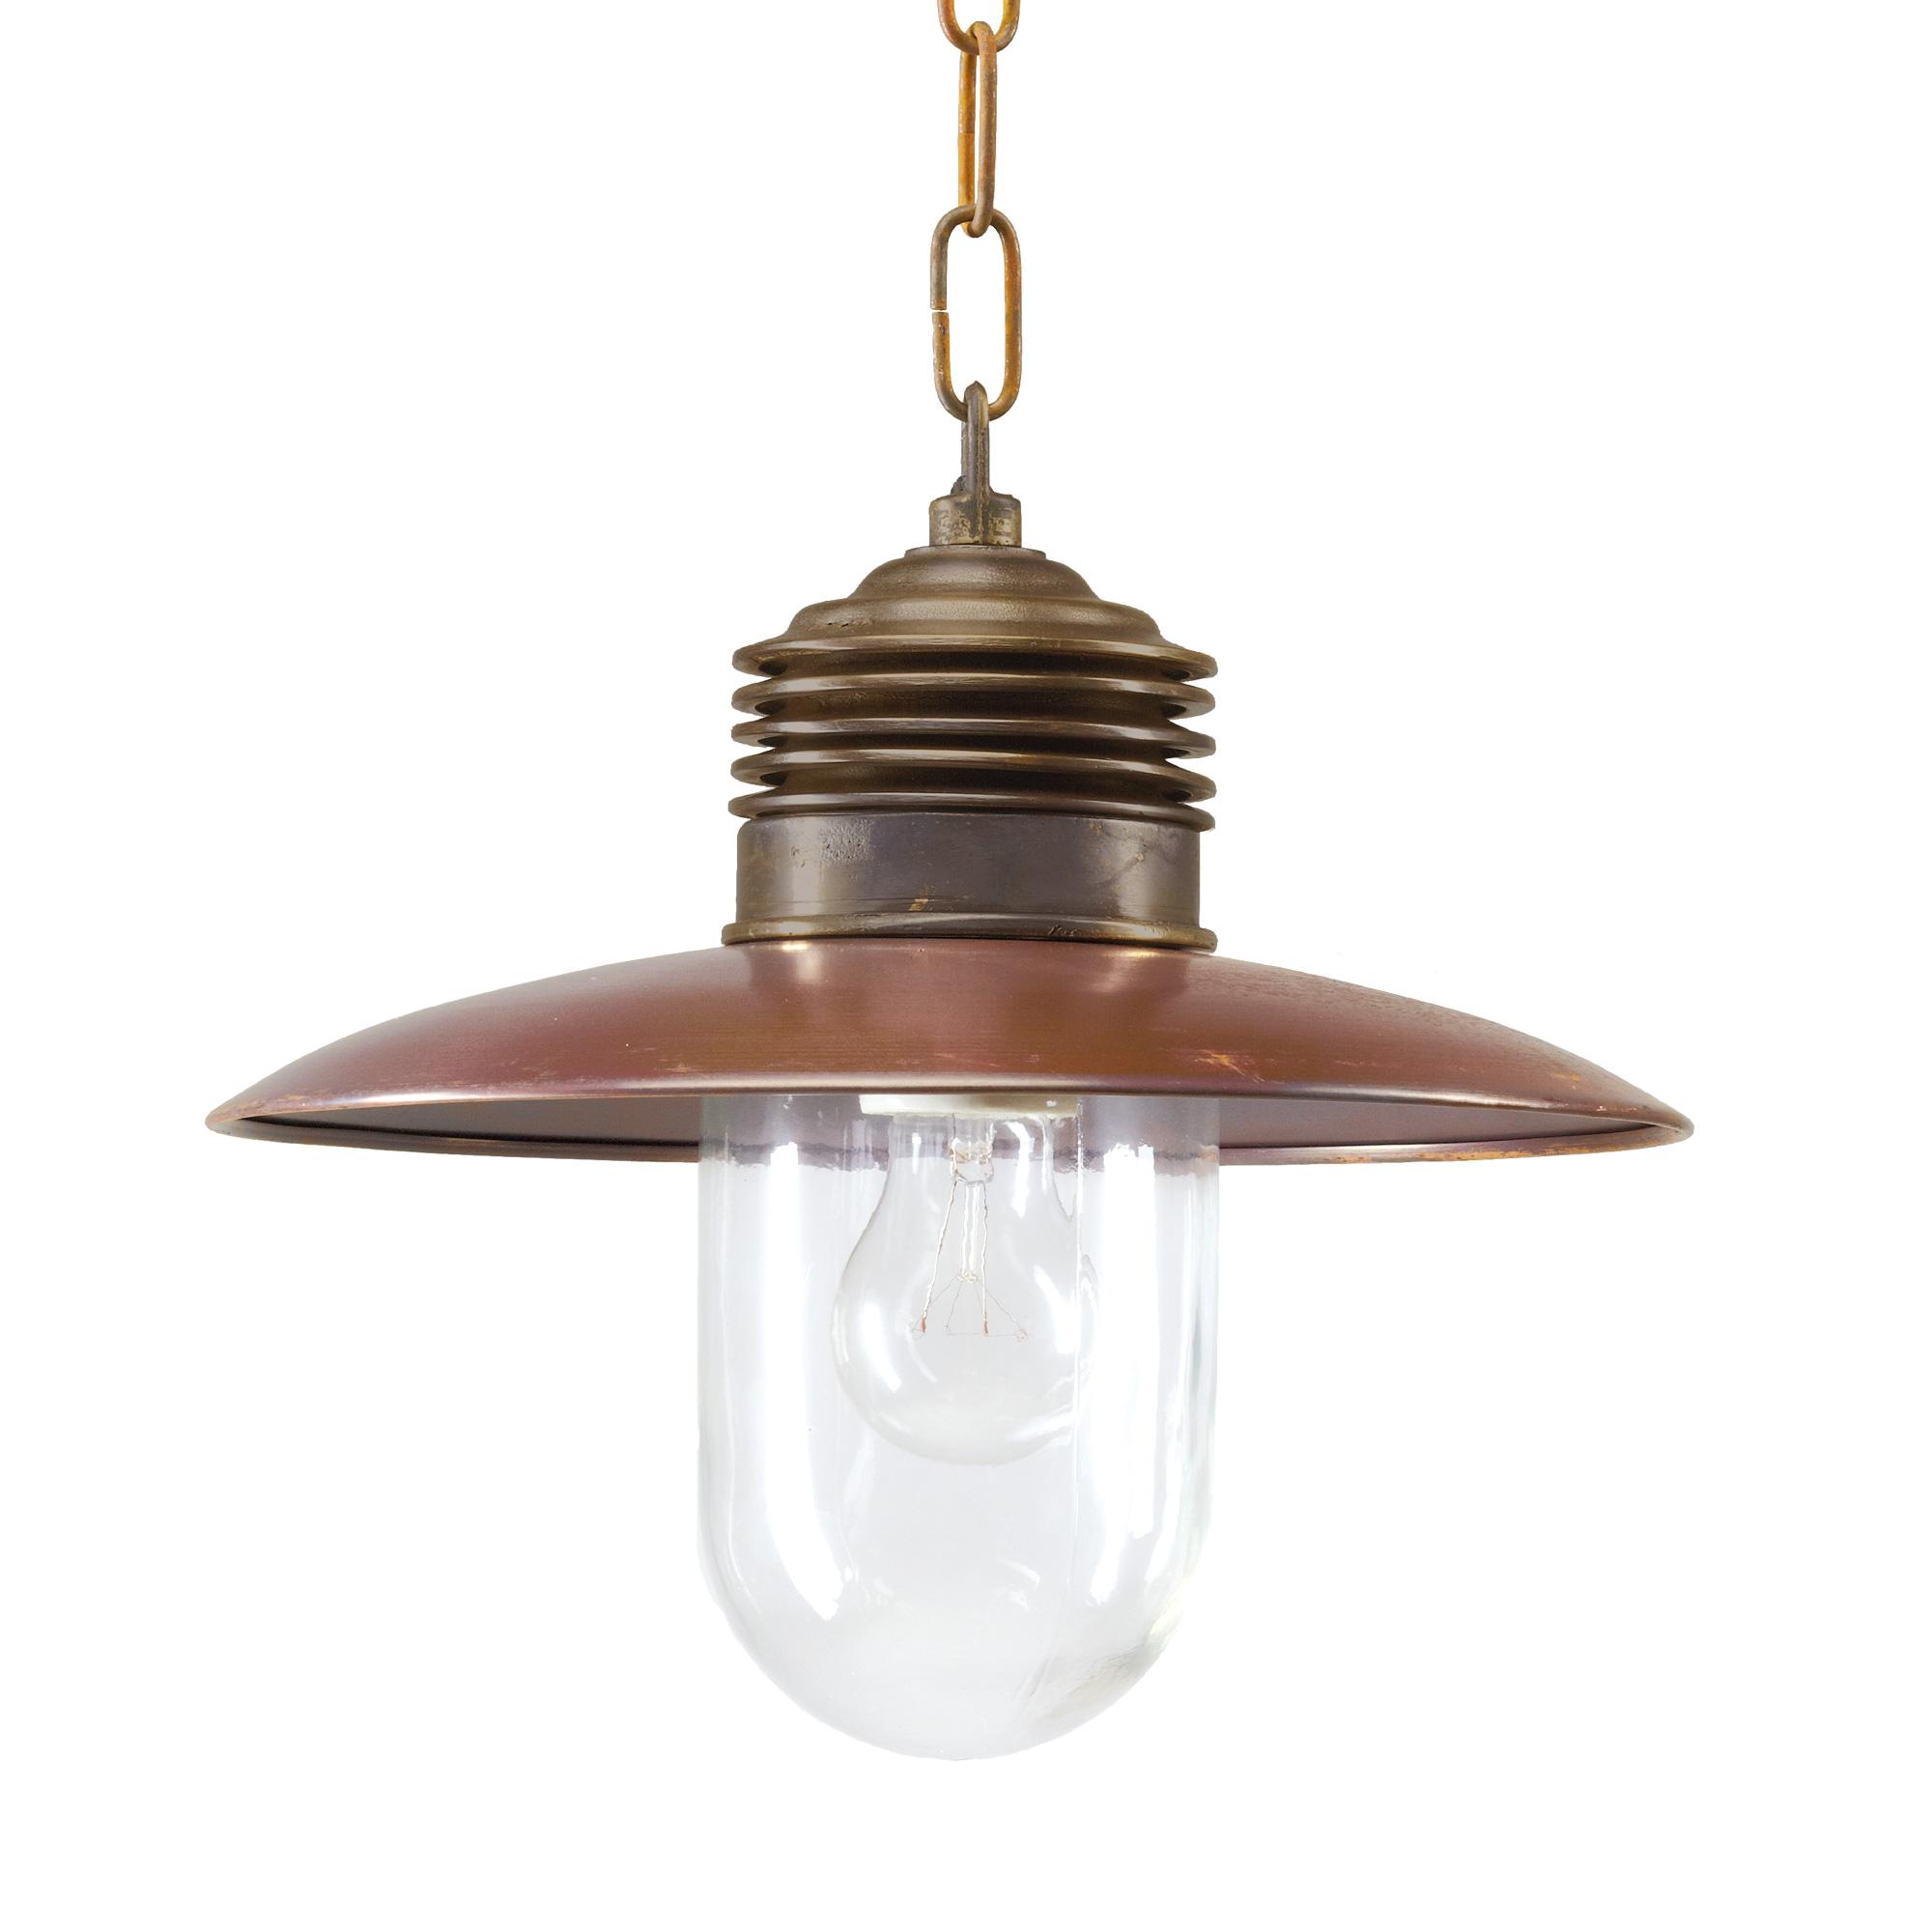 Hanglamp Ampère Brons Koper